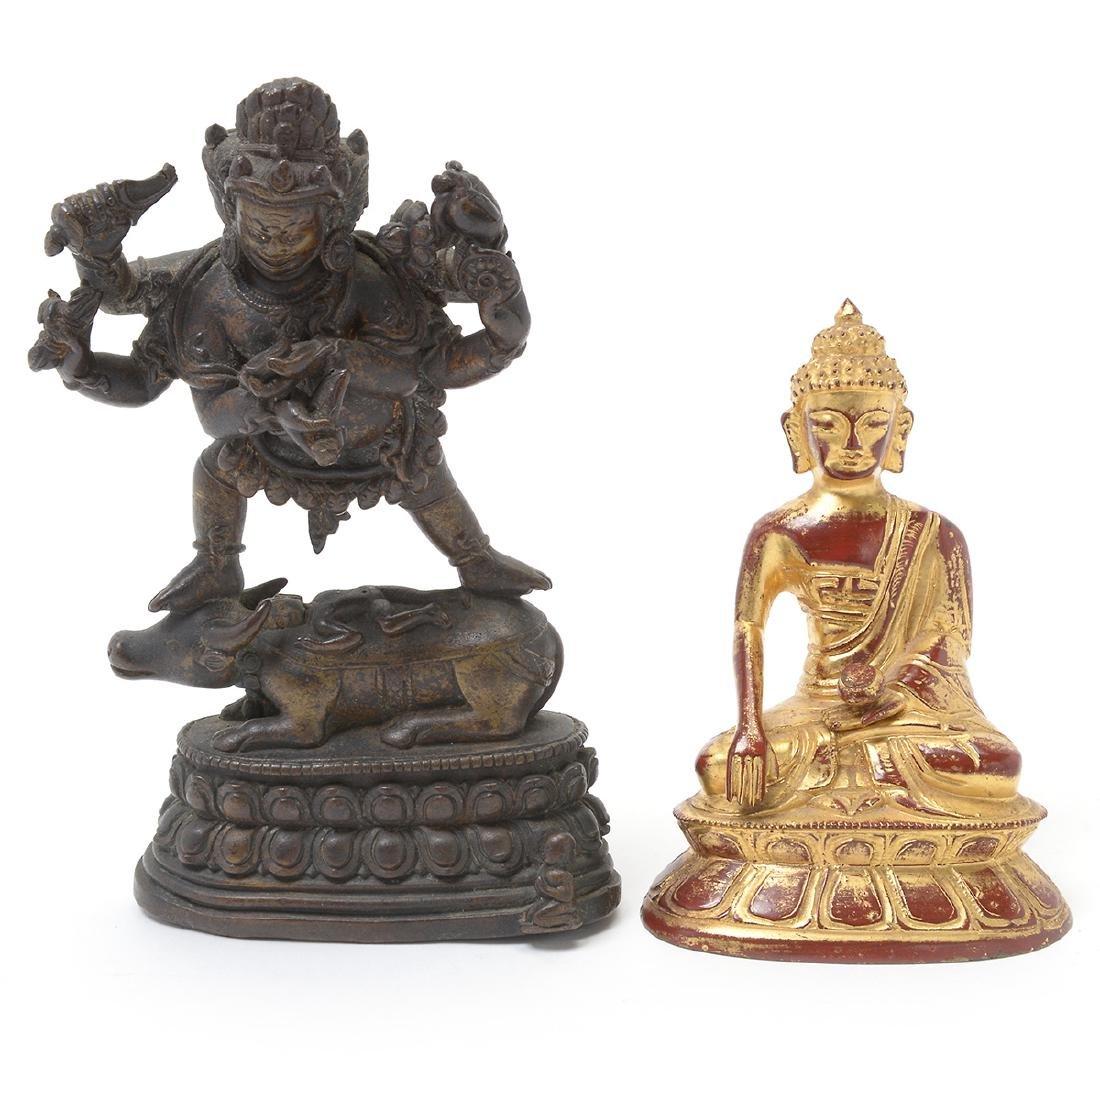 Two Bronze Buddhist Figures, 17th/18th Century